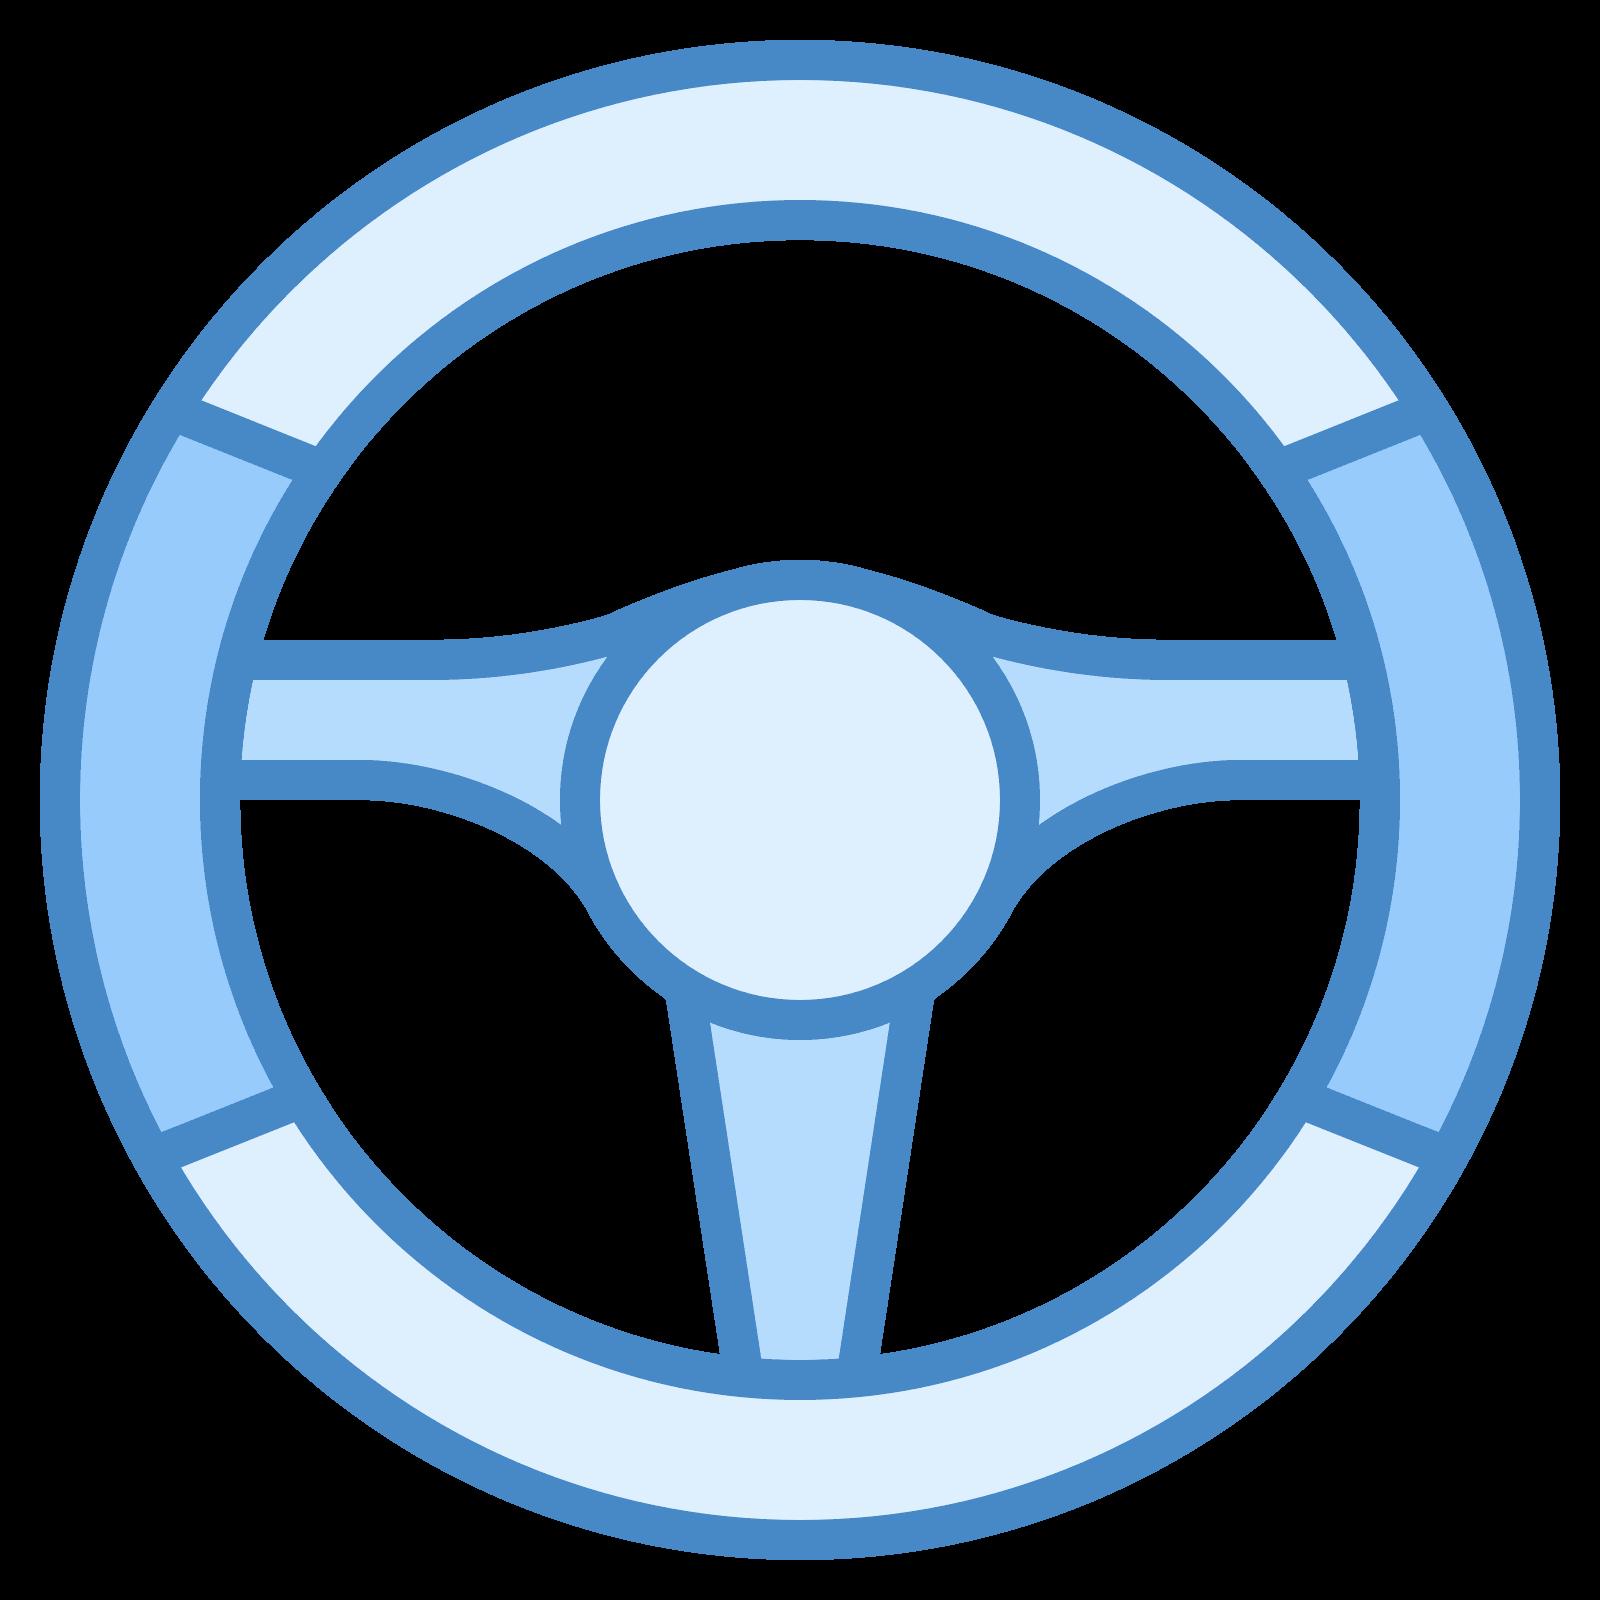 Wheel clipart steering wheel. Car computer icons clip